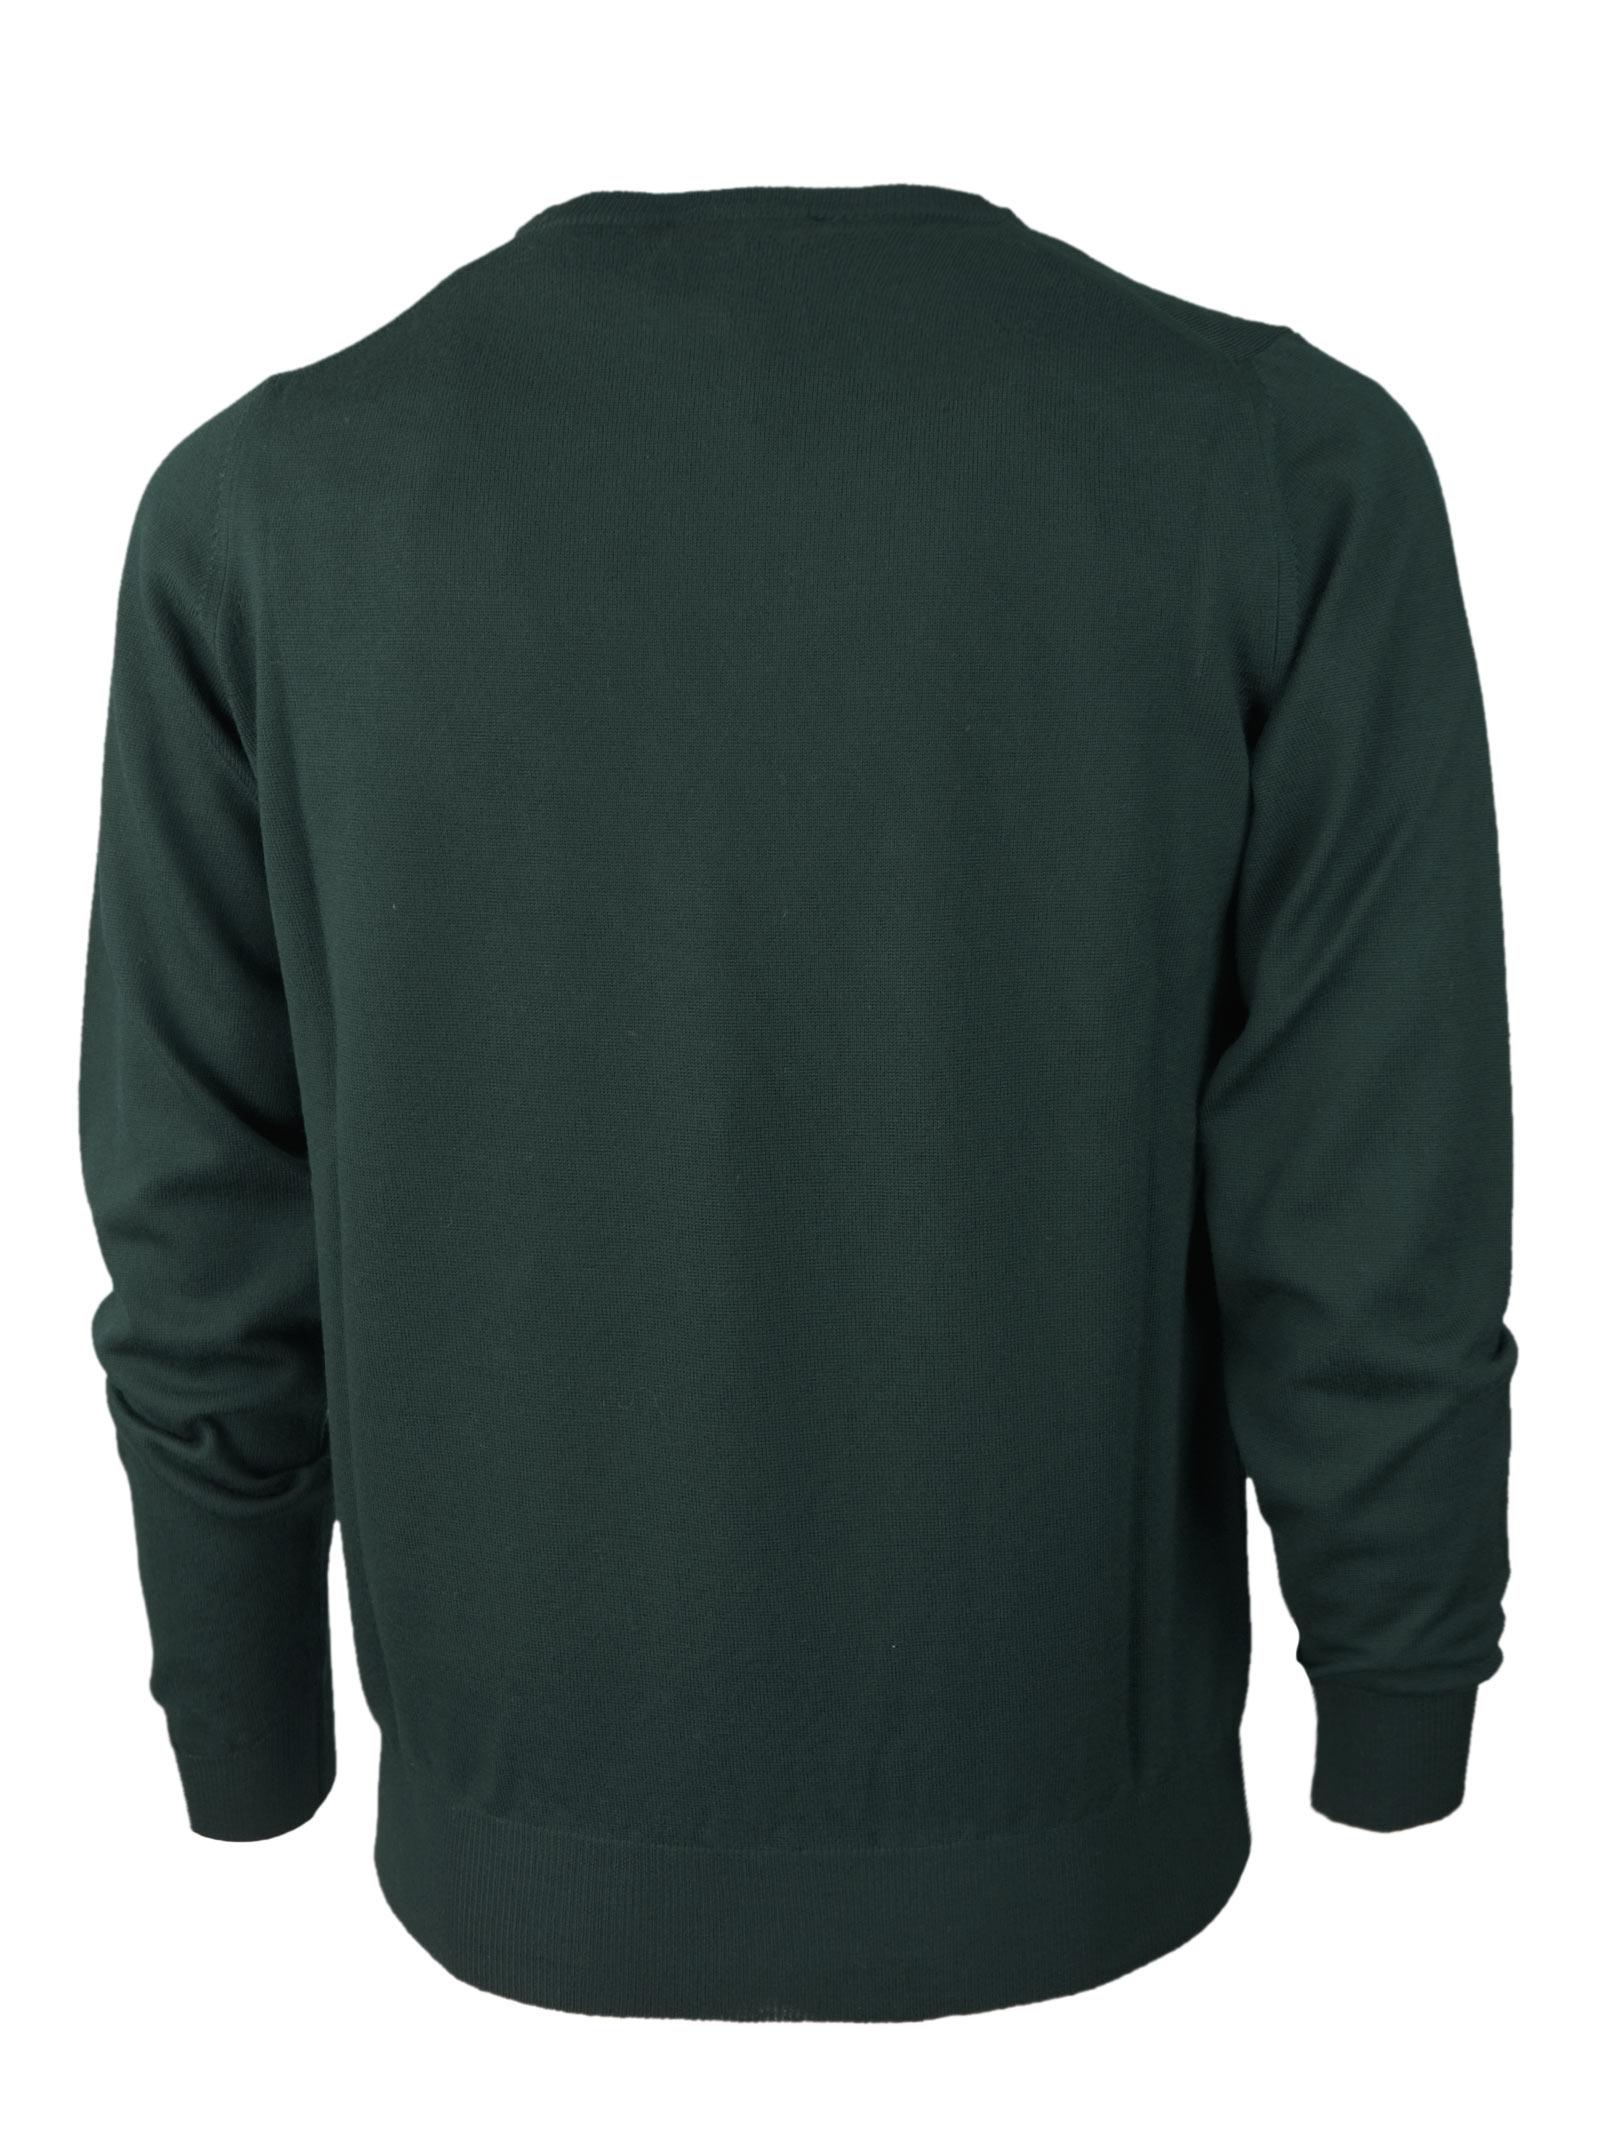 Crew neck pullover BROOKSFIELD   Knitwear   203E.P0010726